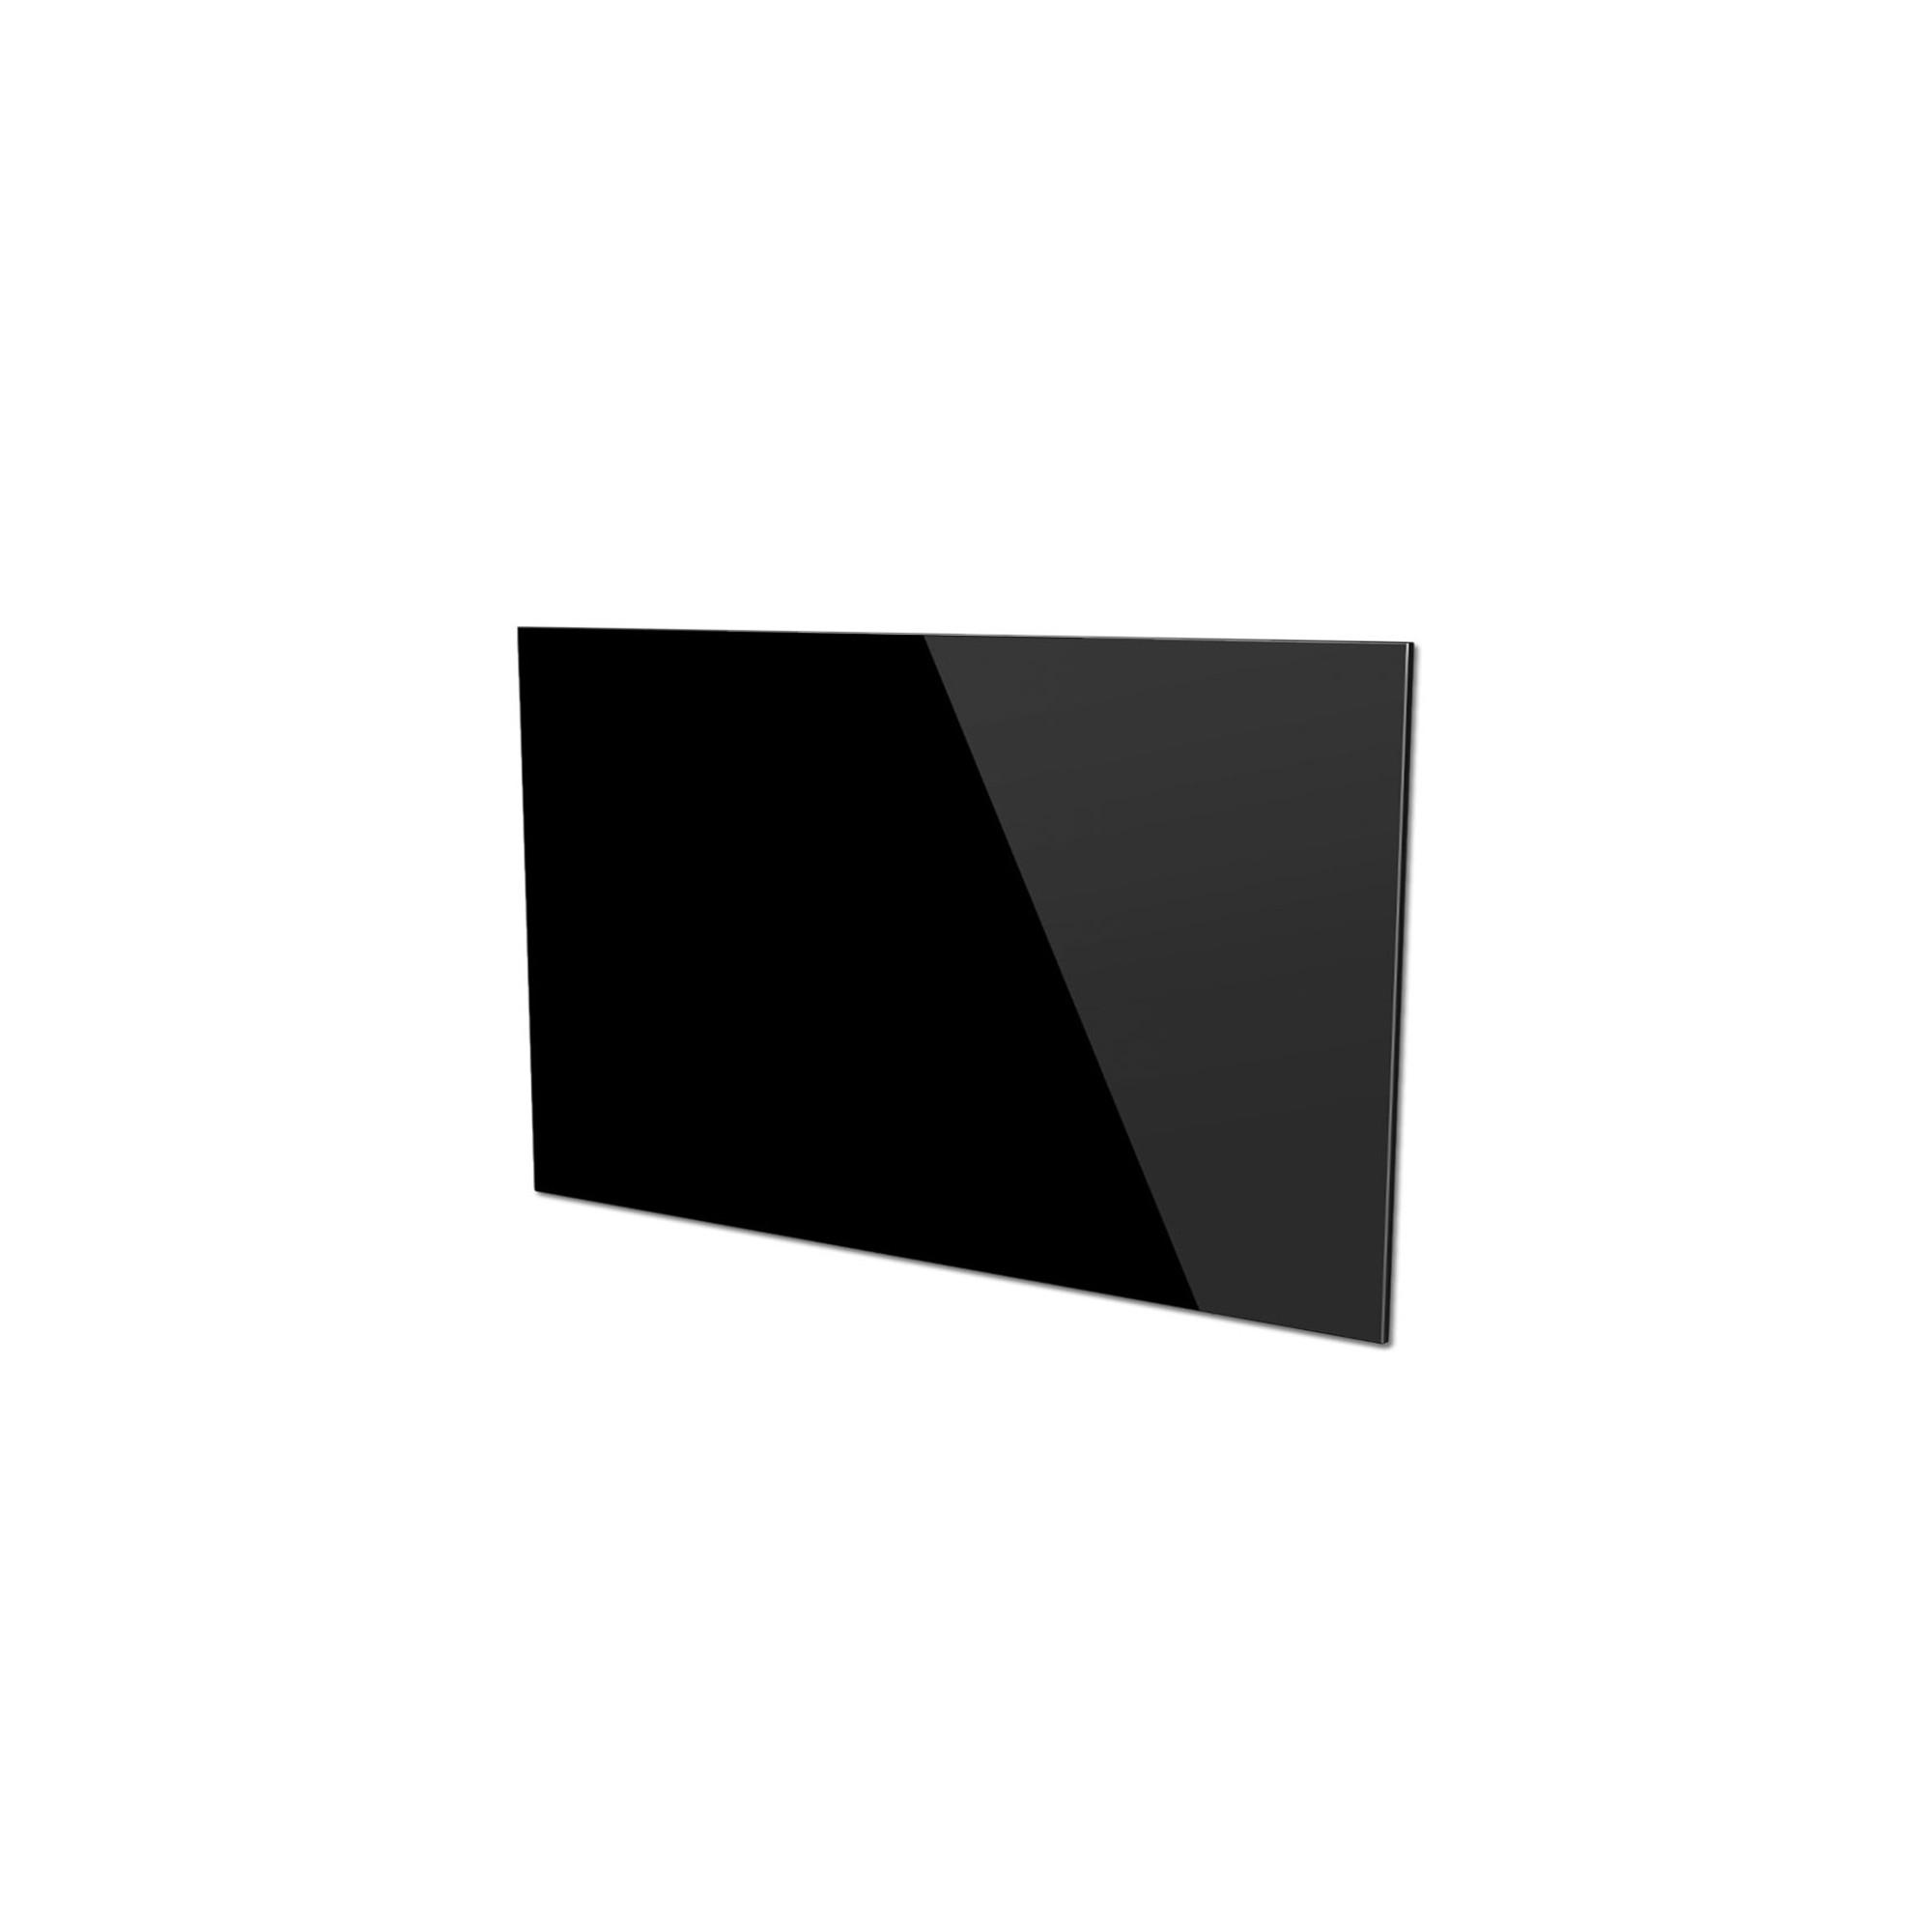 BLACK BACK GLASS KT70M (634X697 MM)